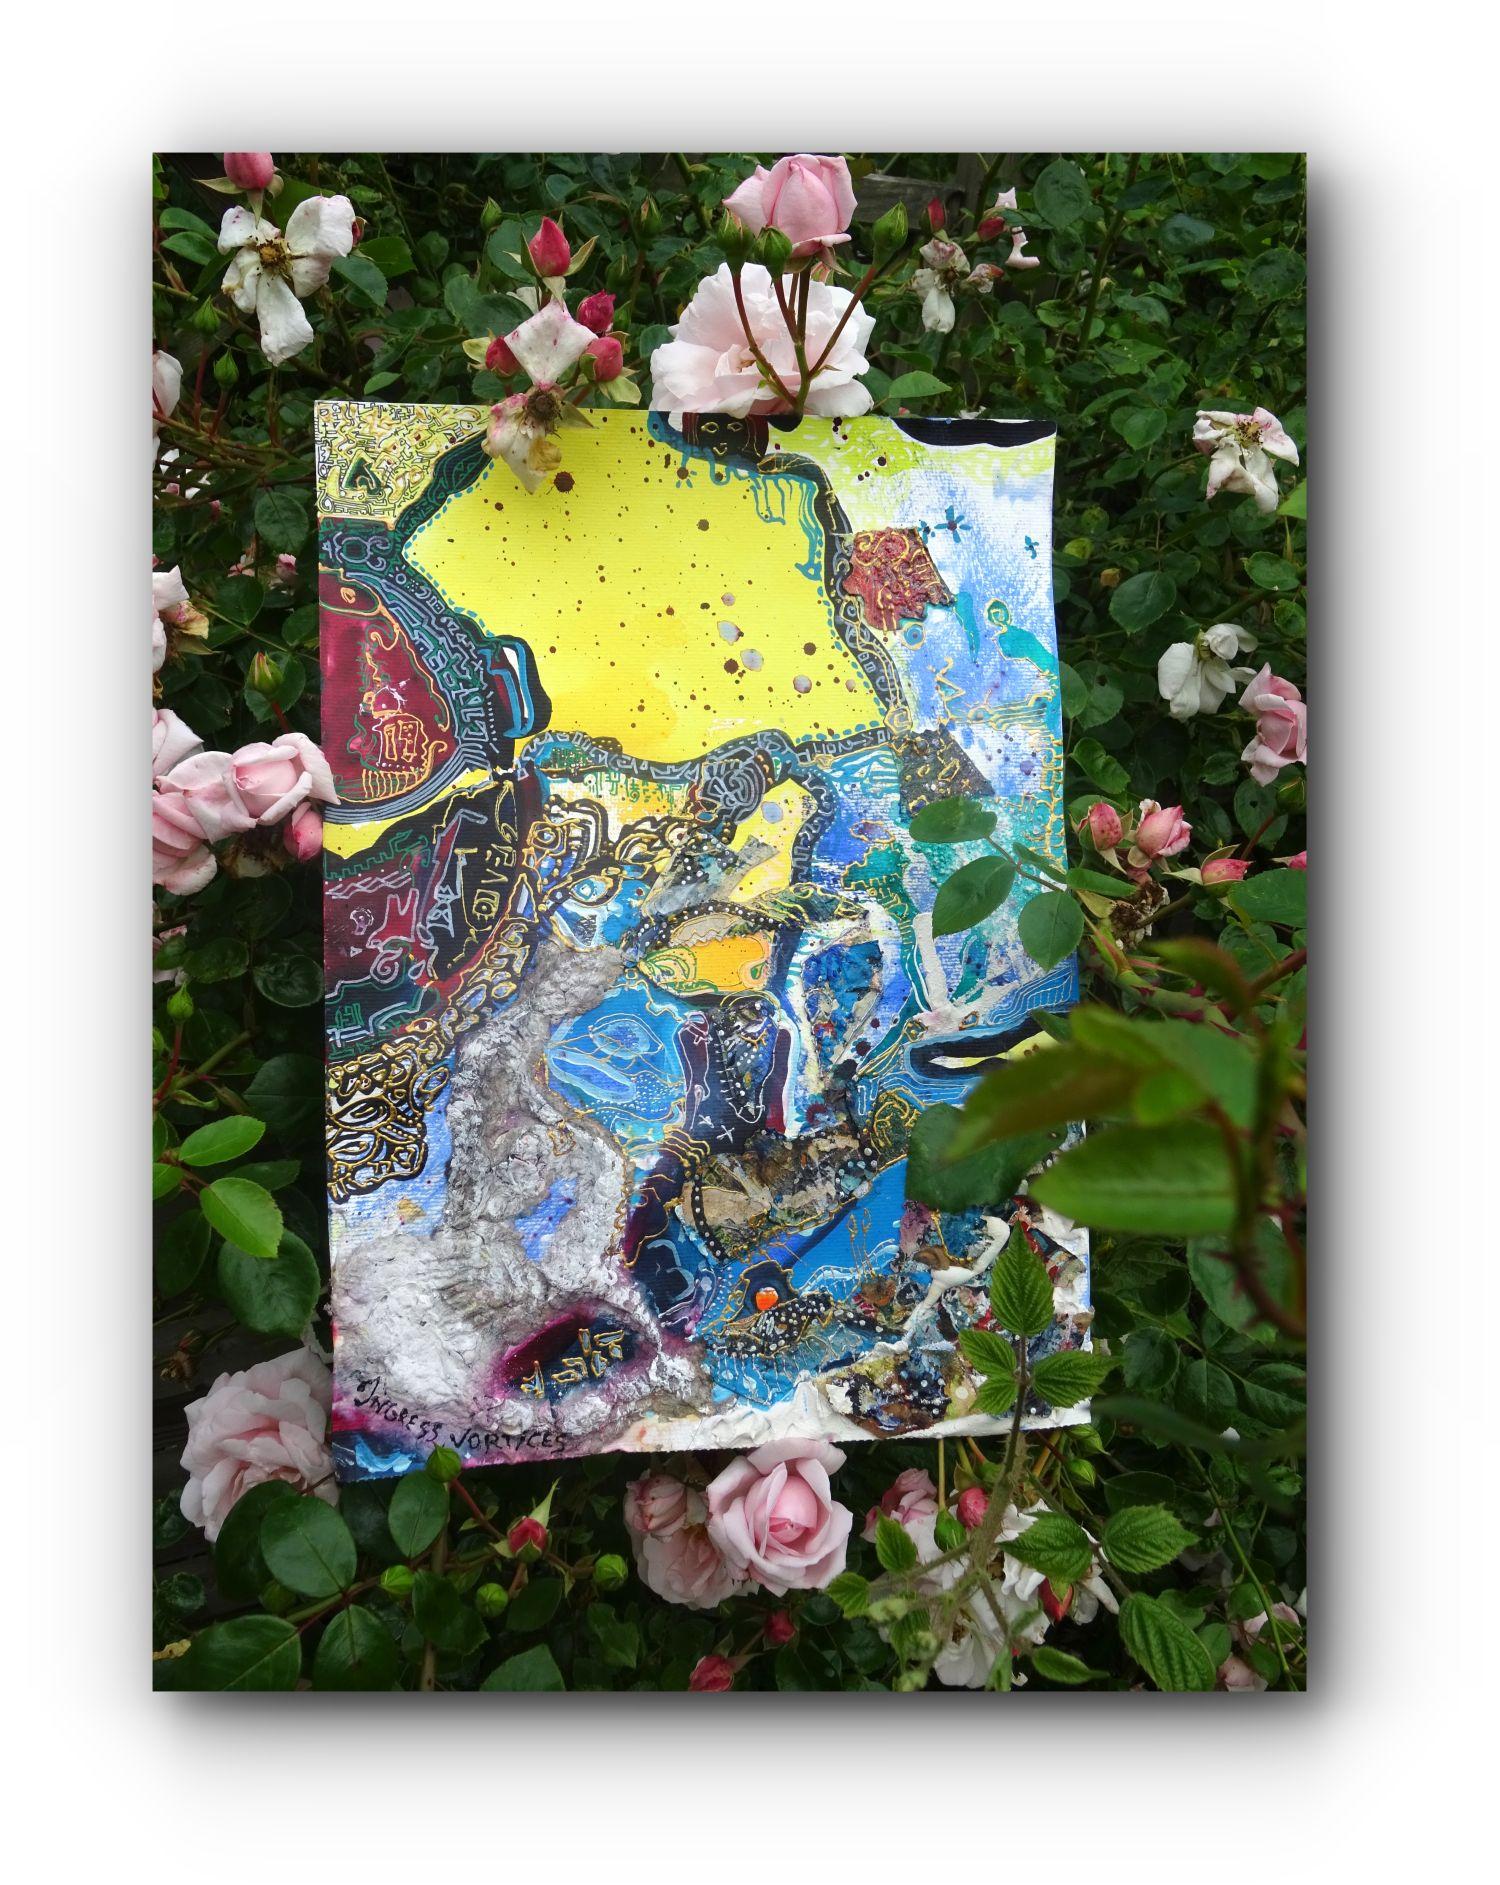 painting-in-garden-6-artist-duo-ingress-vortices.jpg